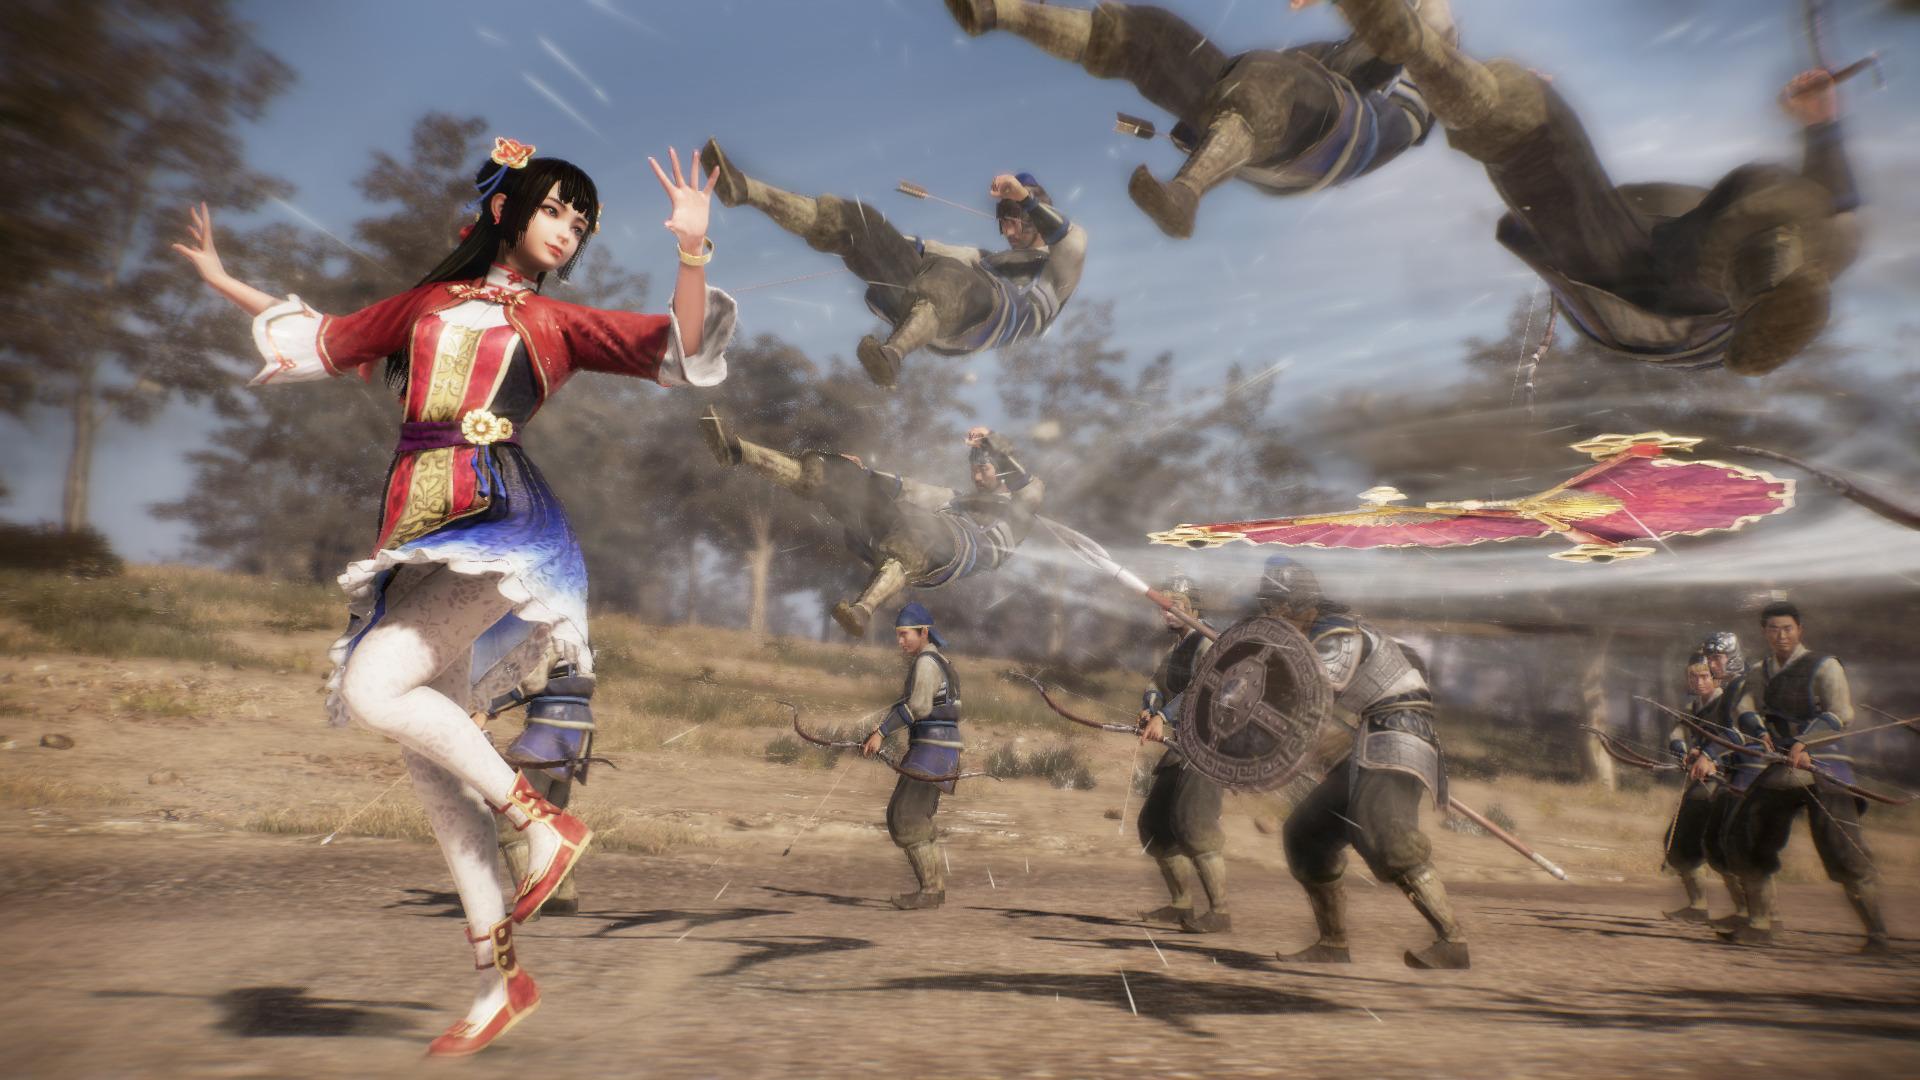 Koei Tecmo Pamerkan Trailer Karakter Baru Dynasty Warriors 9 Unjuk Gaya Bertarung Dan Jurus Spesial Gamebrott Com